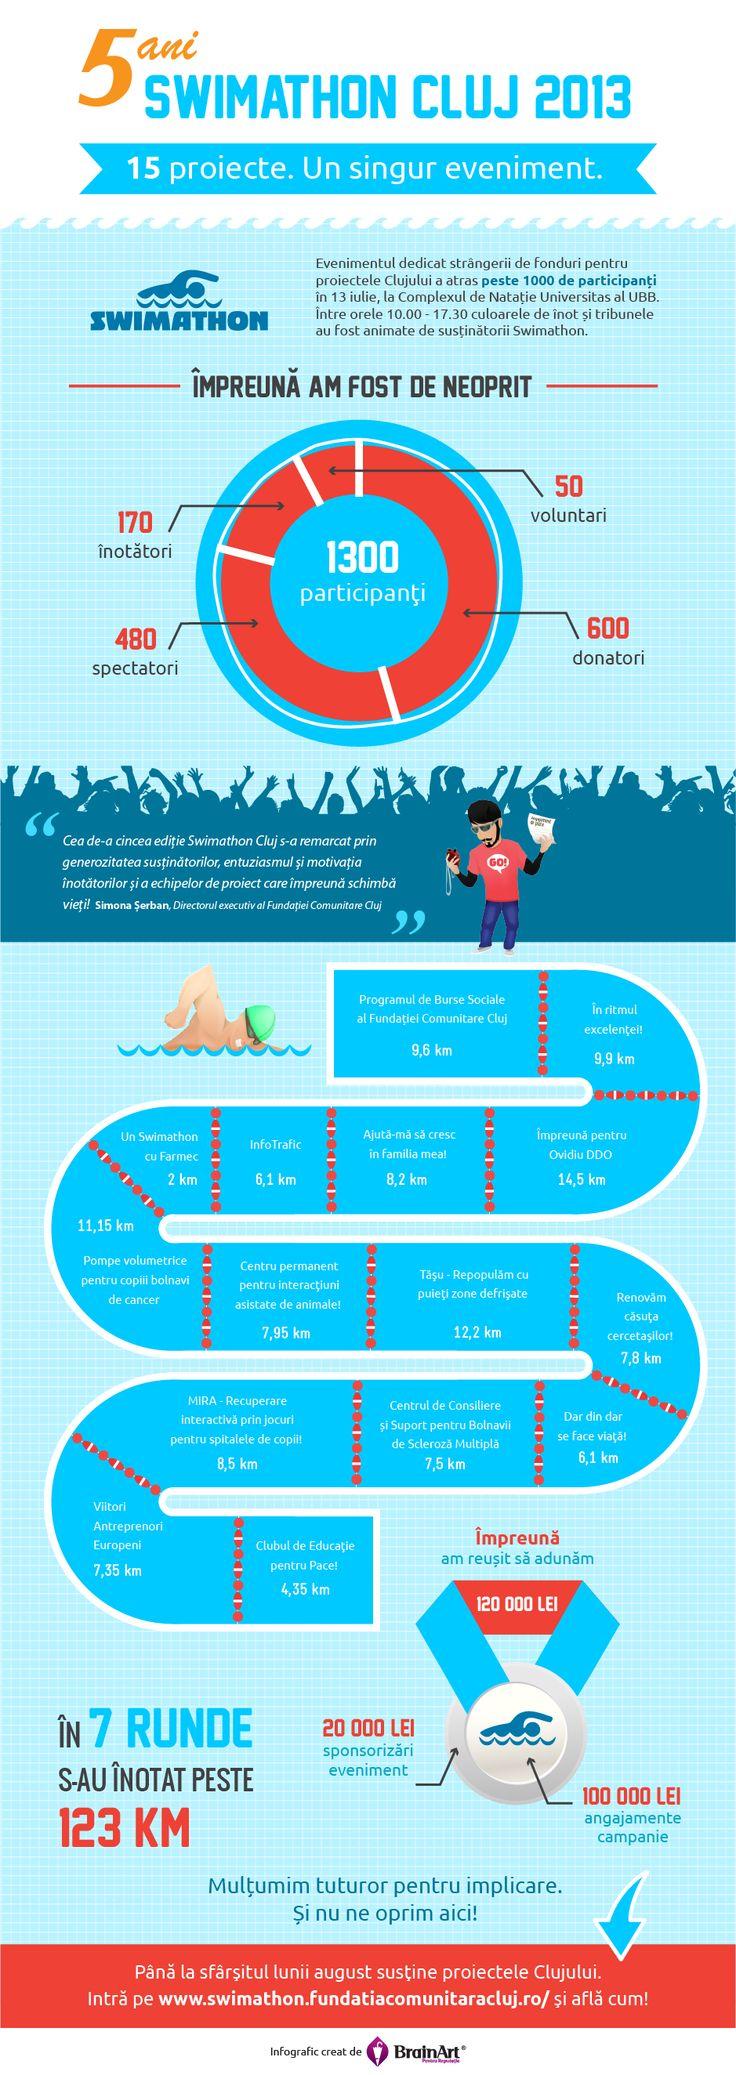 Swimathon infographic report cluj